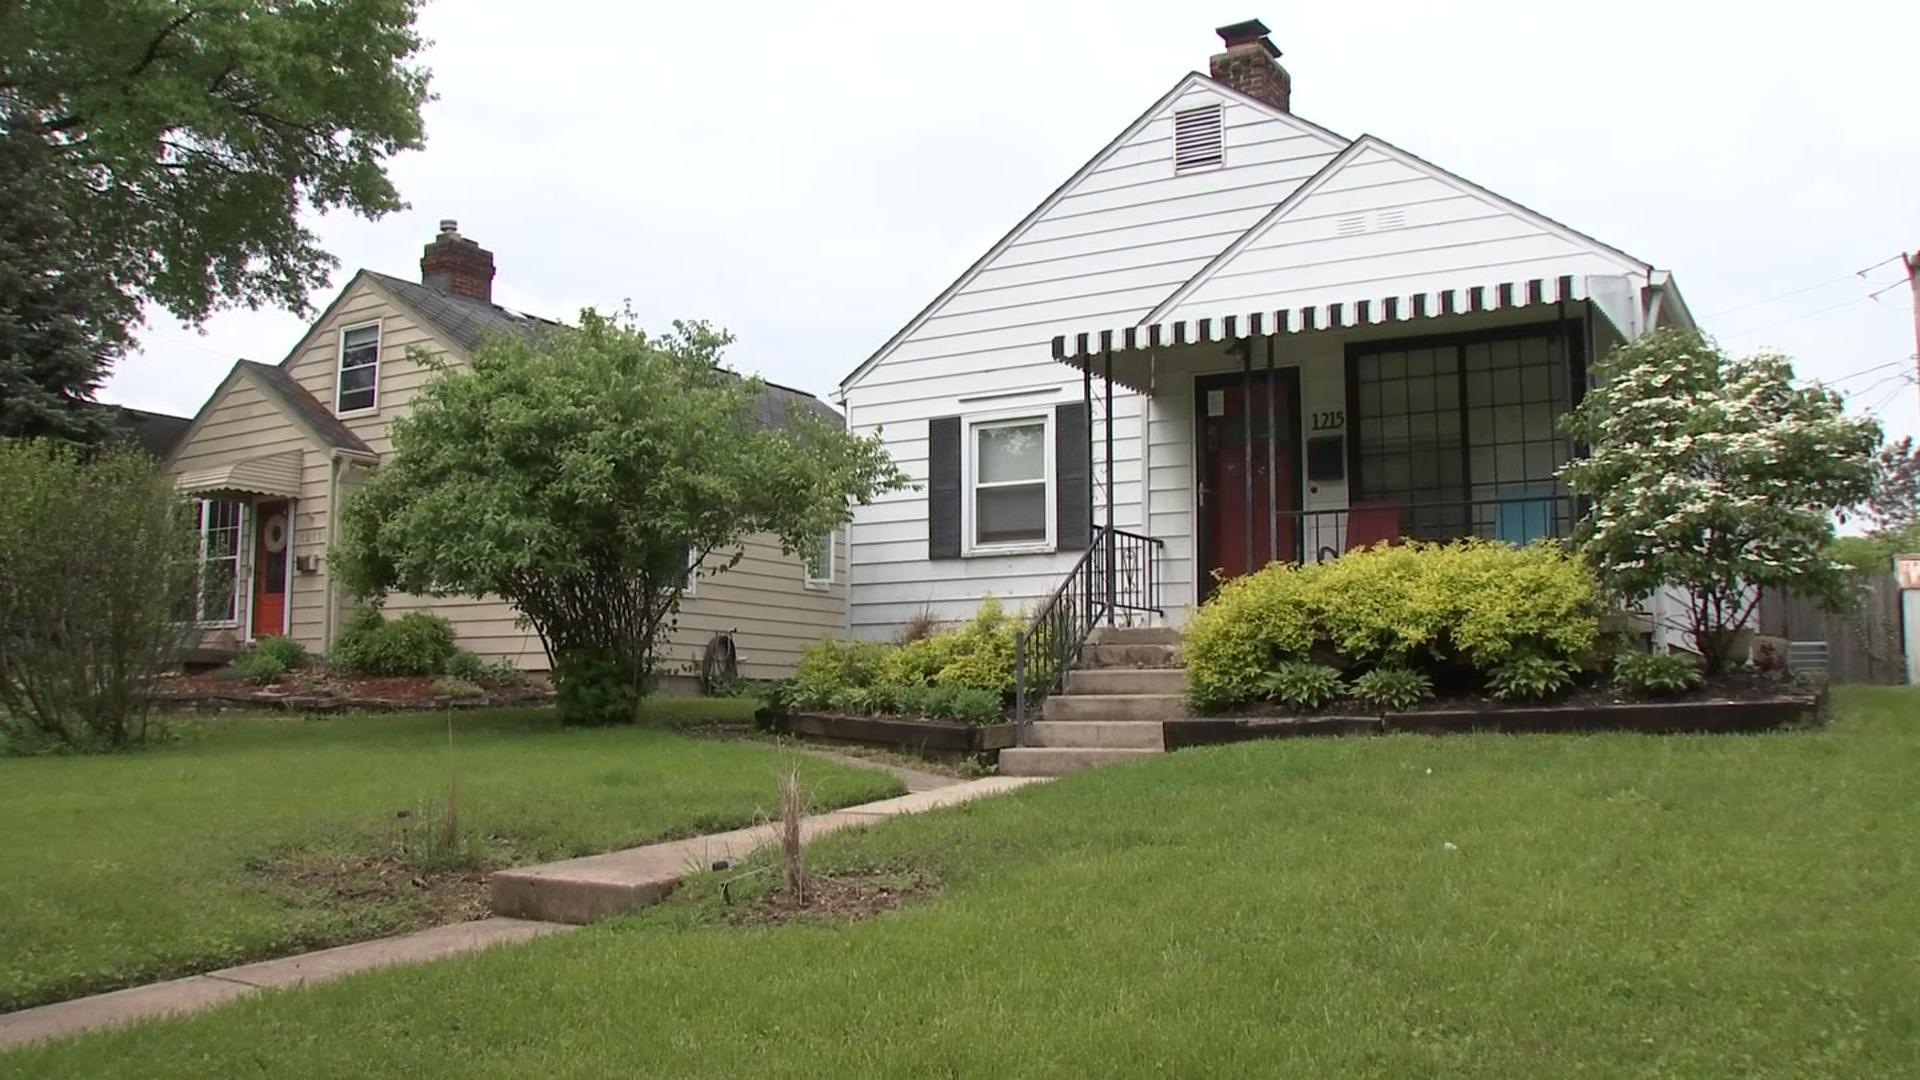 Neighbors_complain_to_Grandview_Heights__1_20190518011654